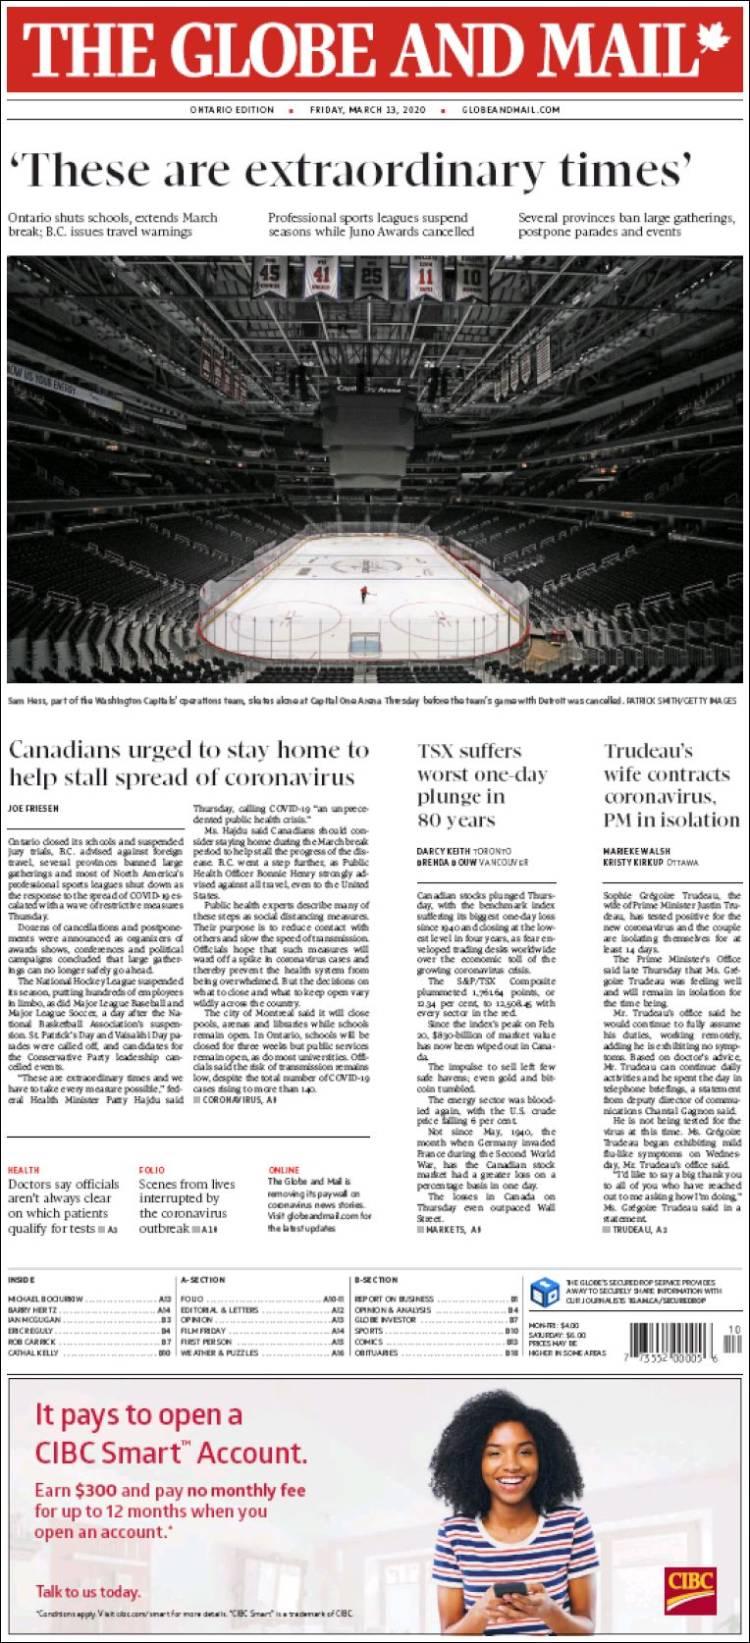 Periódico The Globe and Mail (Canadá). Periódicos de